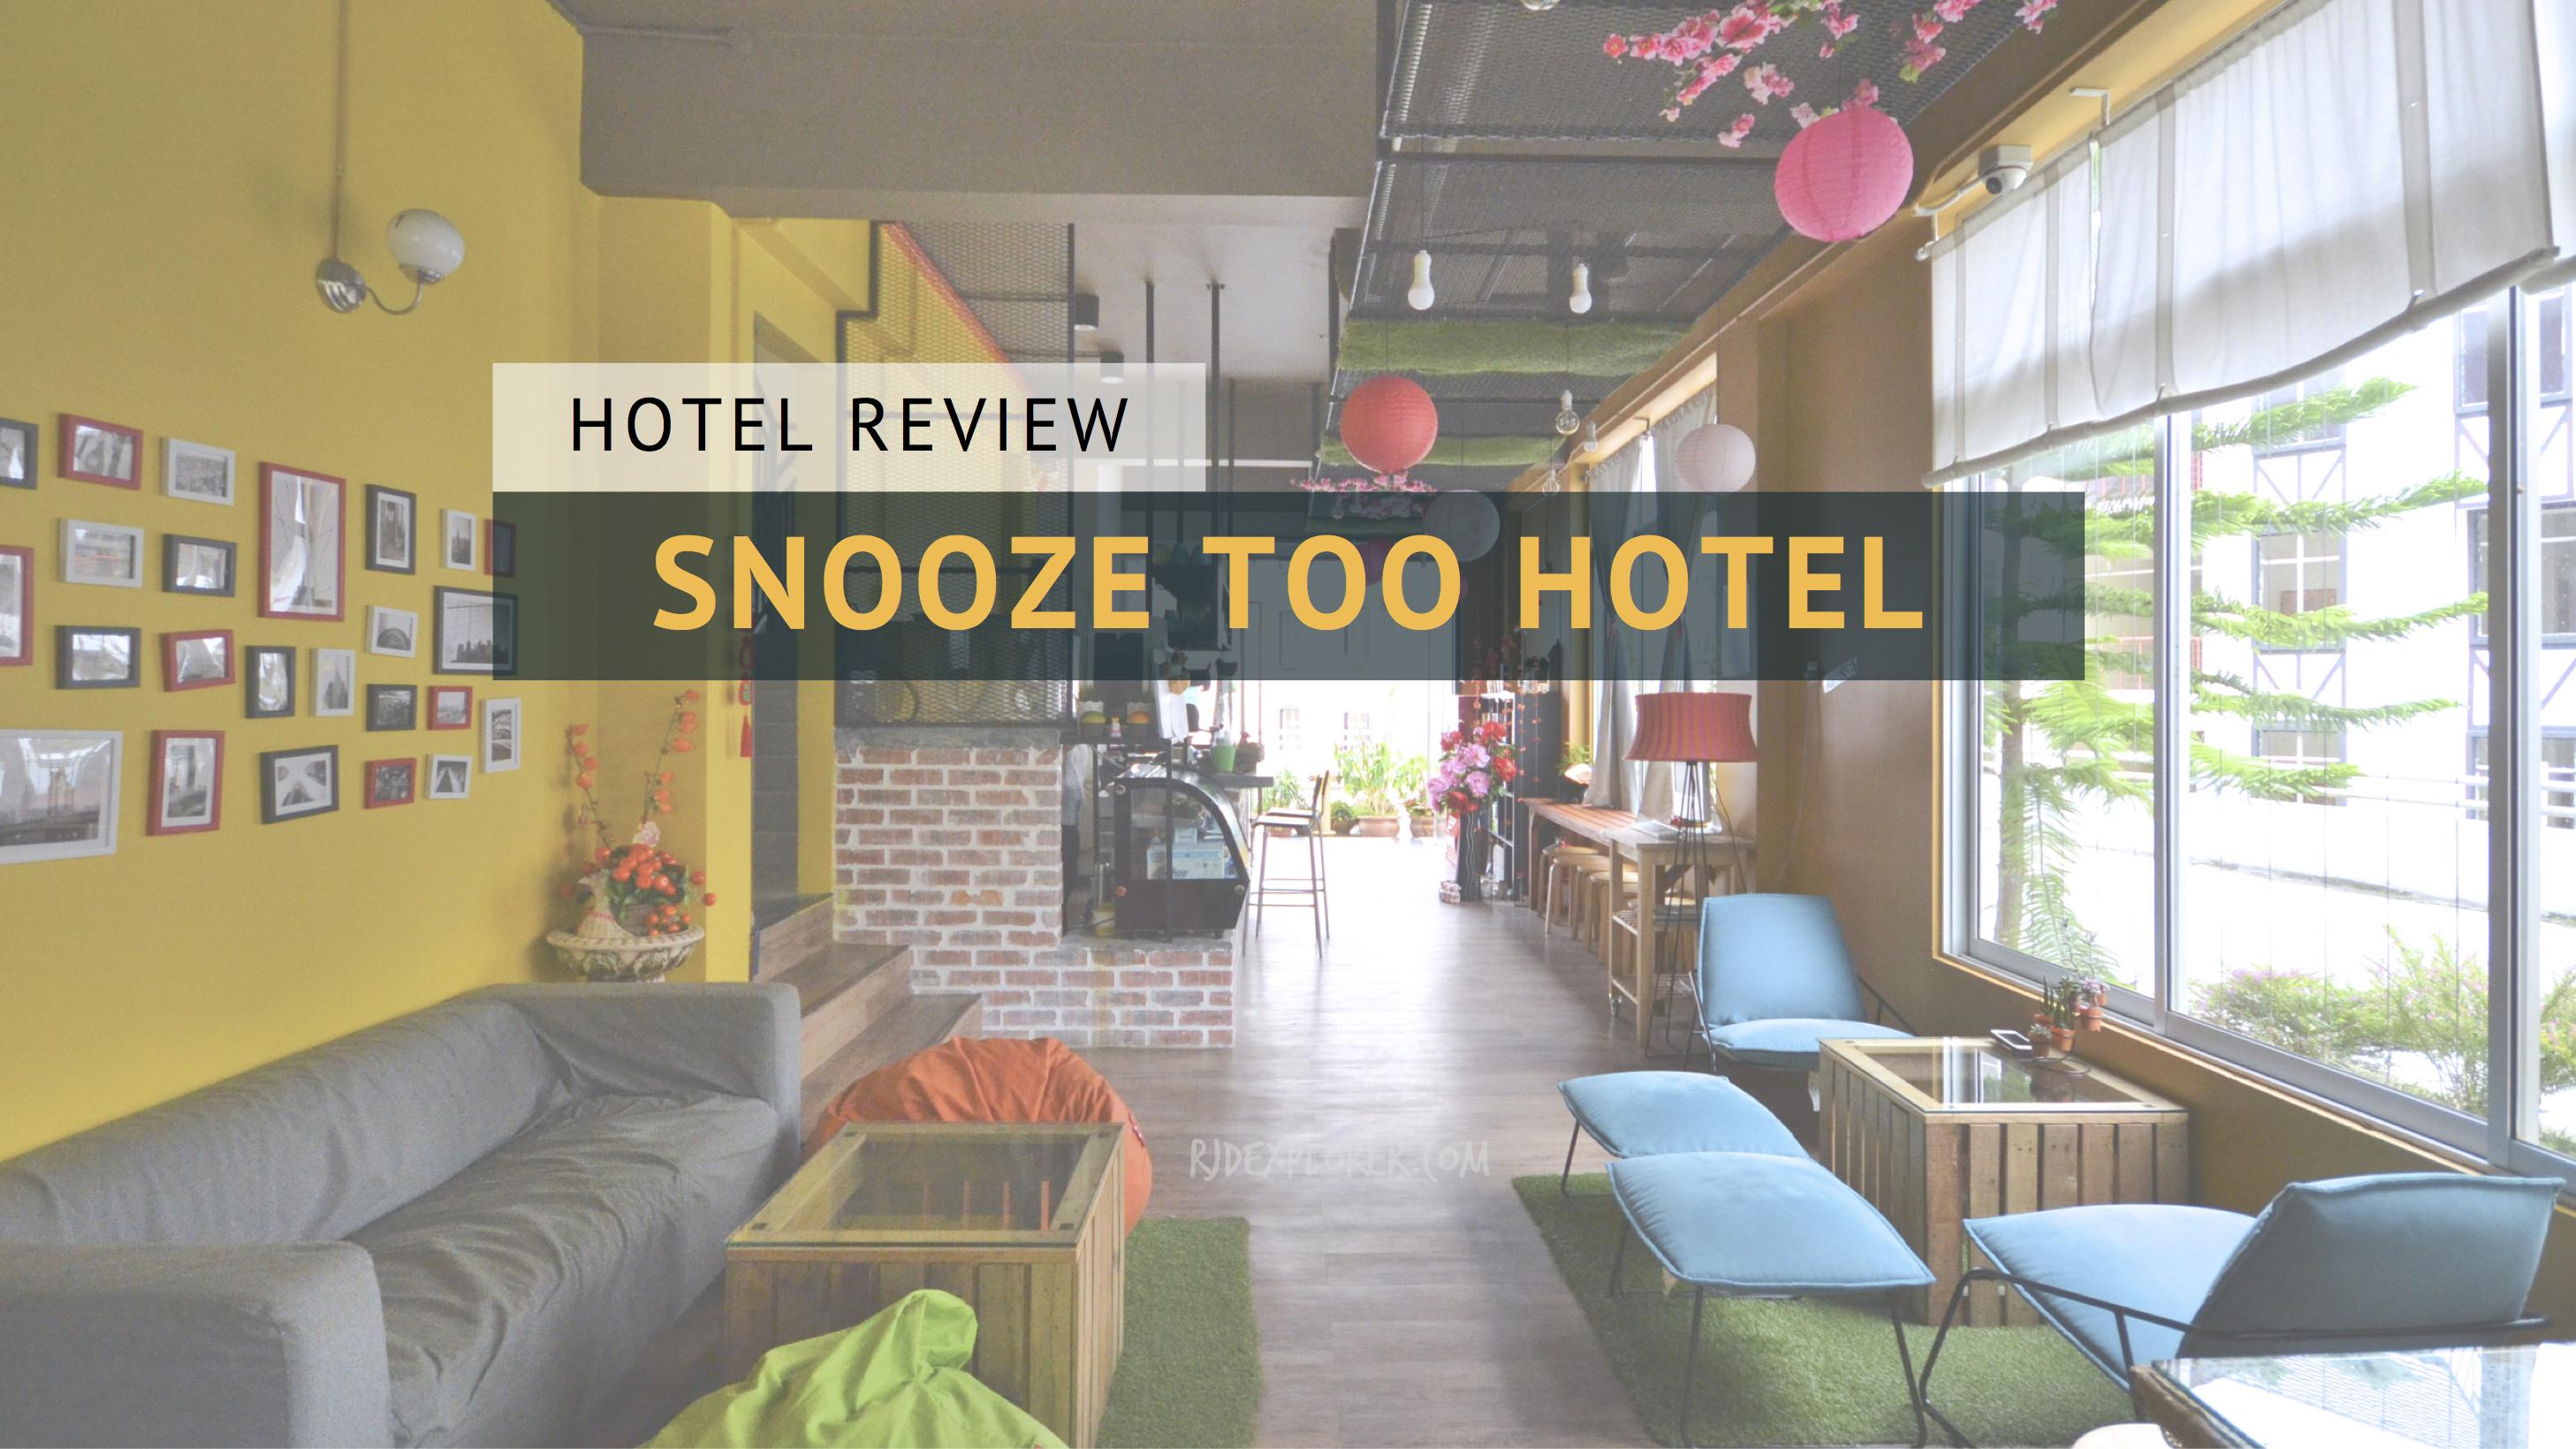 snooze too hotel cameron highland review brad erva doce info rh brad erva doce info